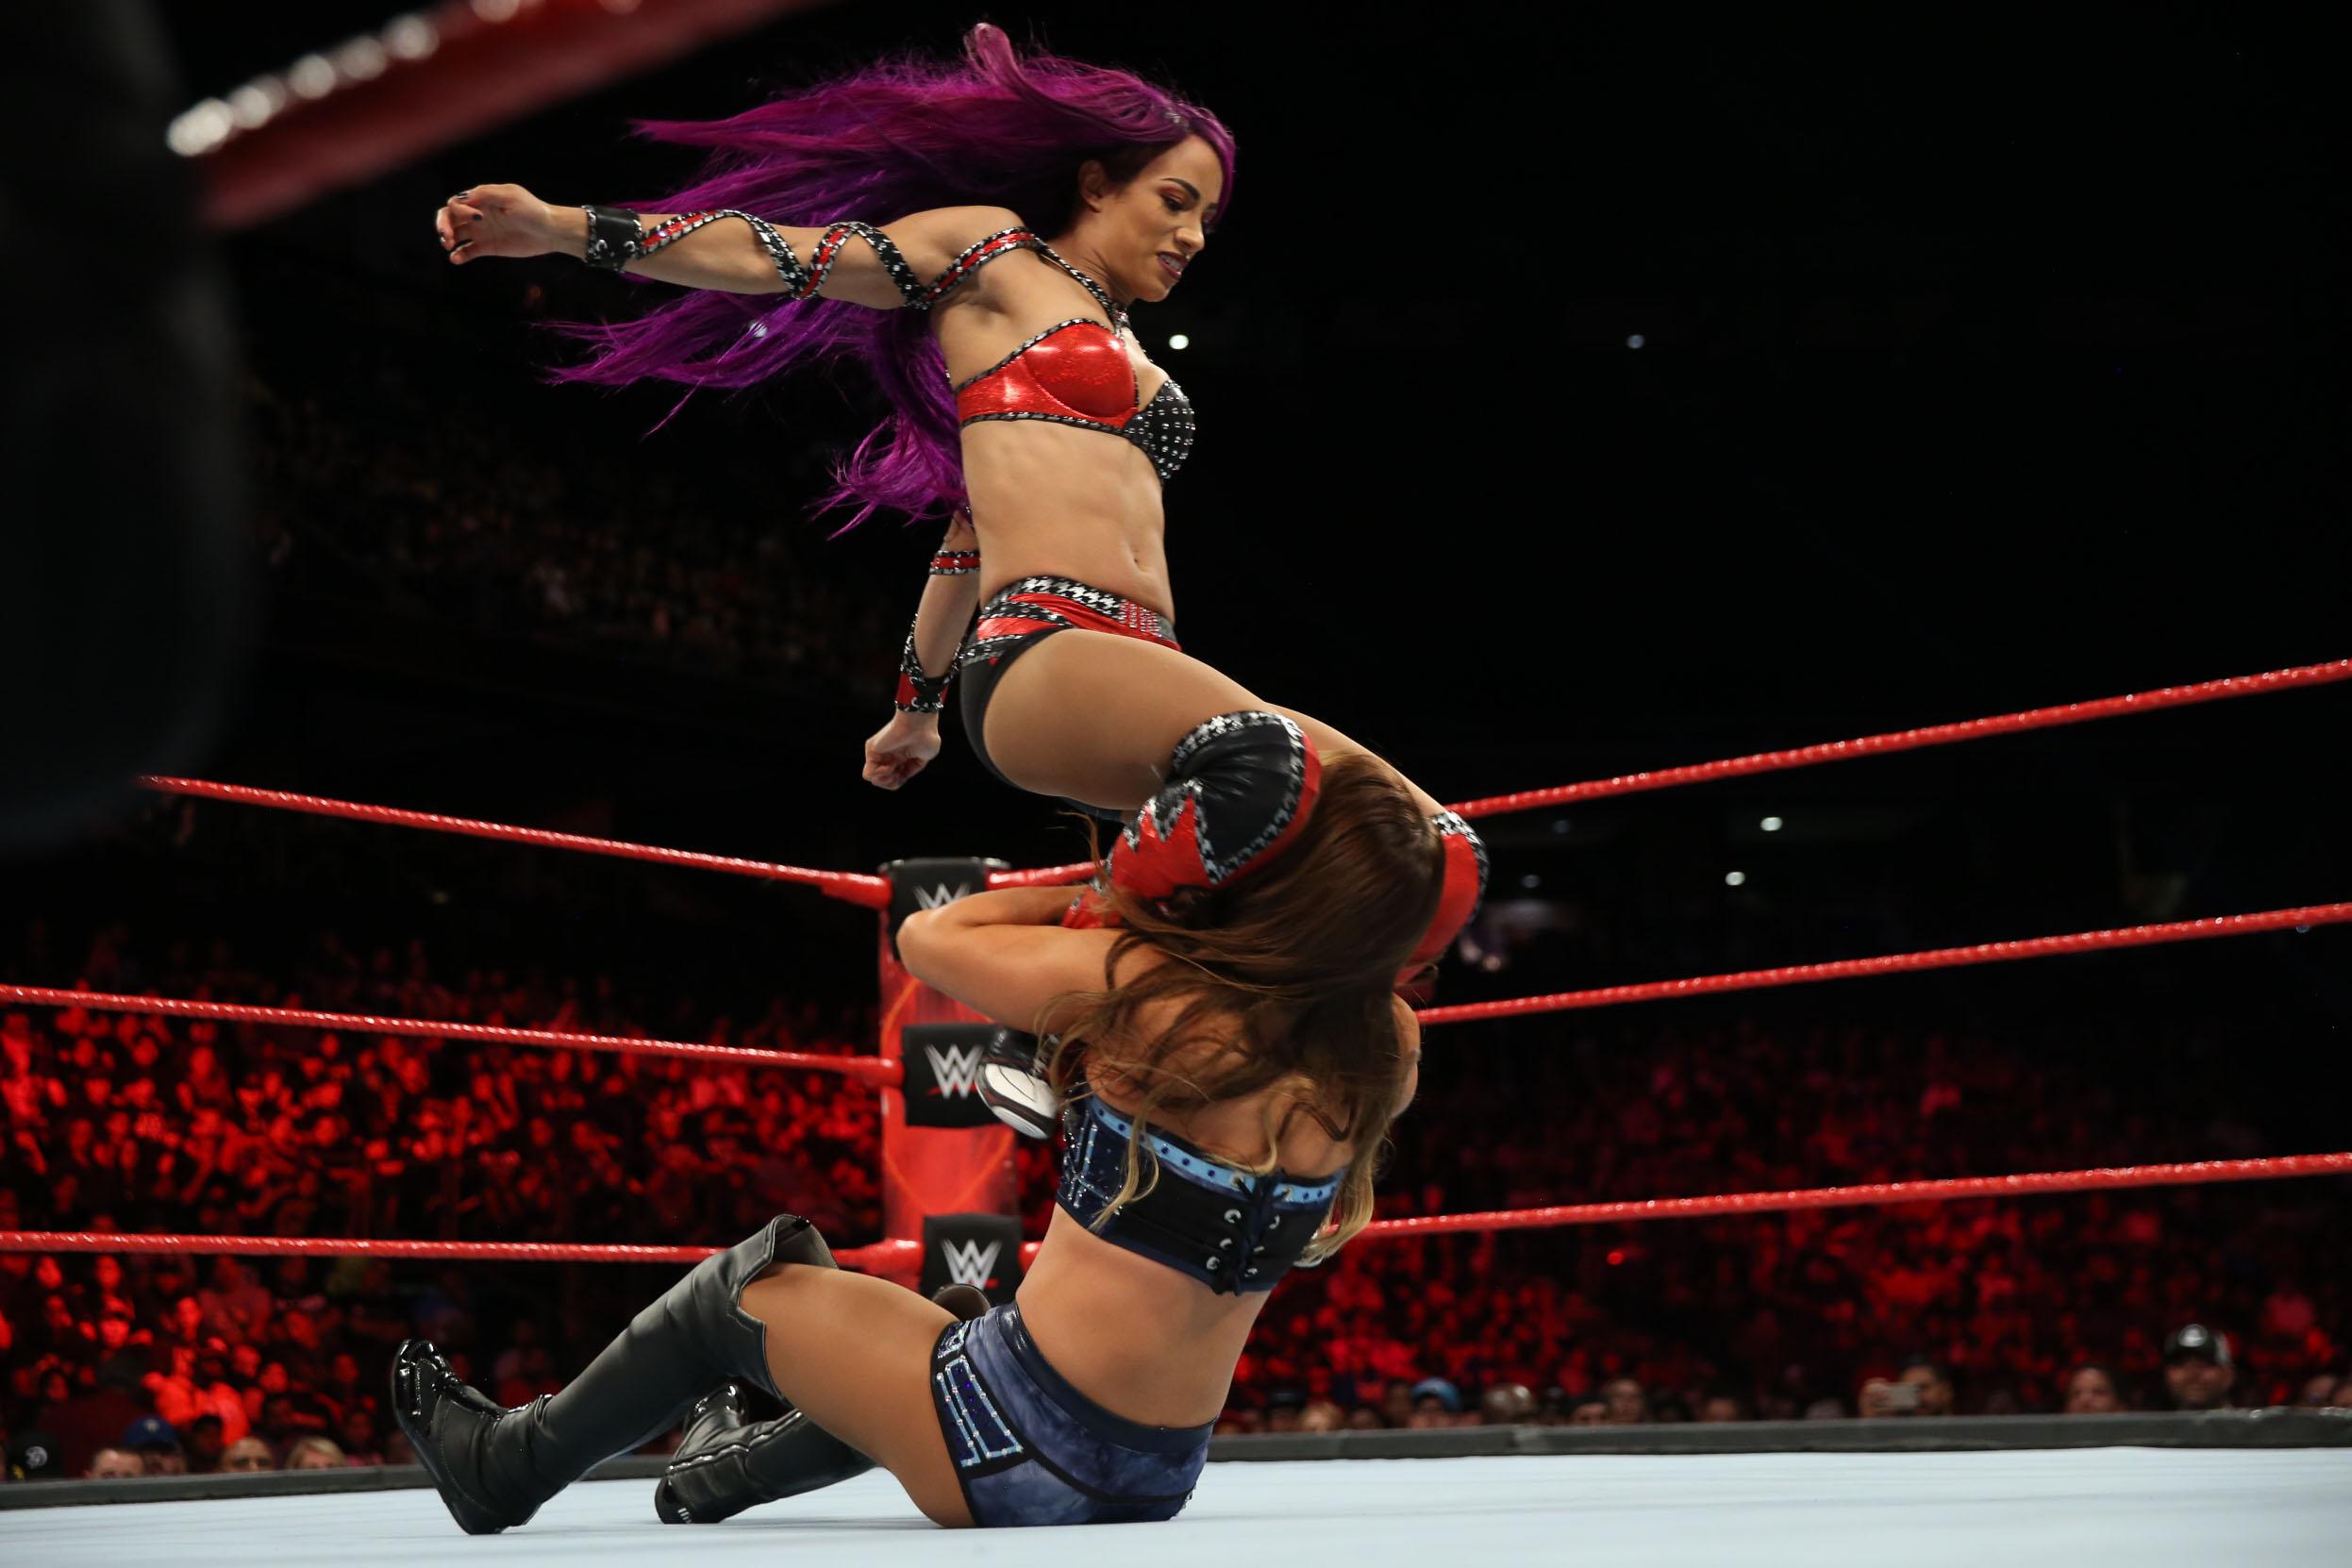 Sasha Banks wwe wrestling